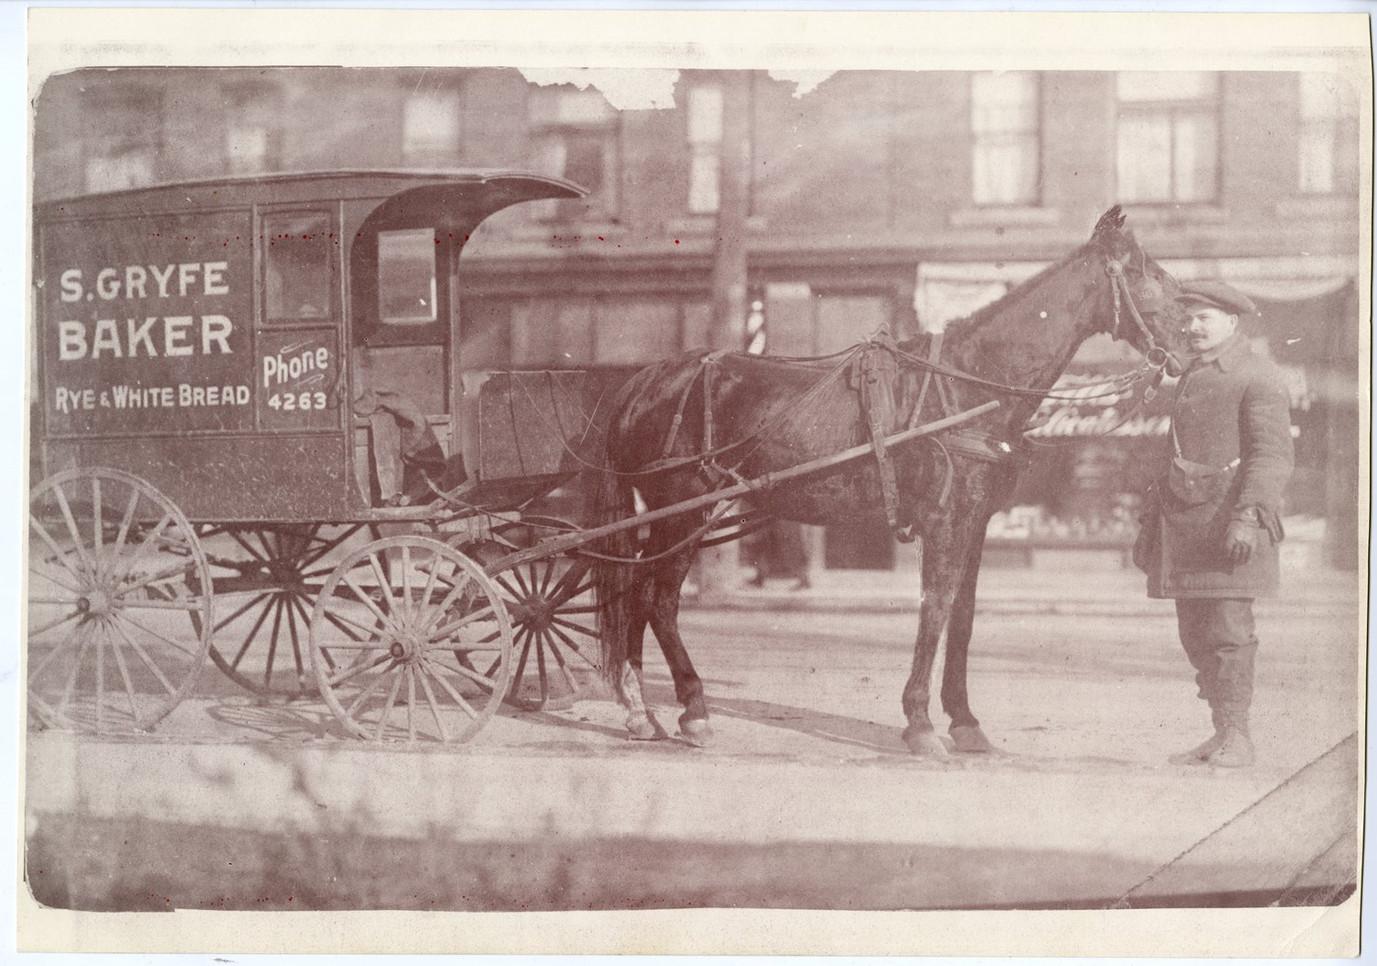 Sam Gryfe with his horse-drawn bakery wagon in Hamilton, Ontario, ca. 1915. OJA, item 6025.